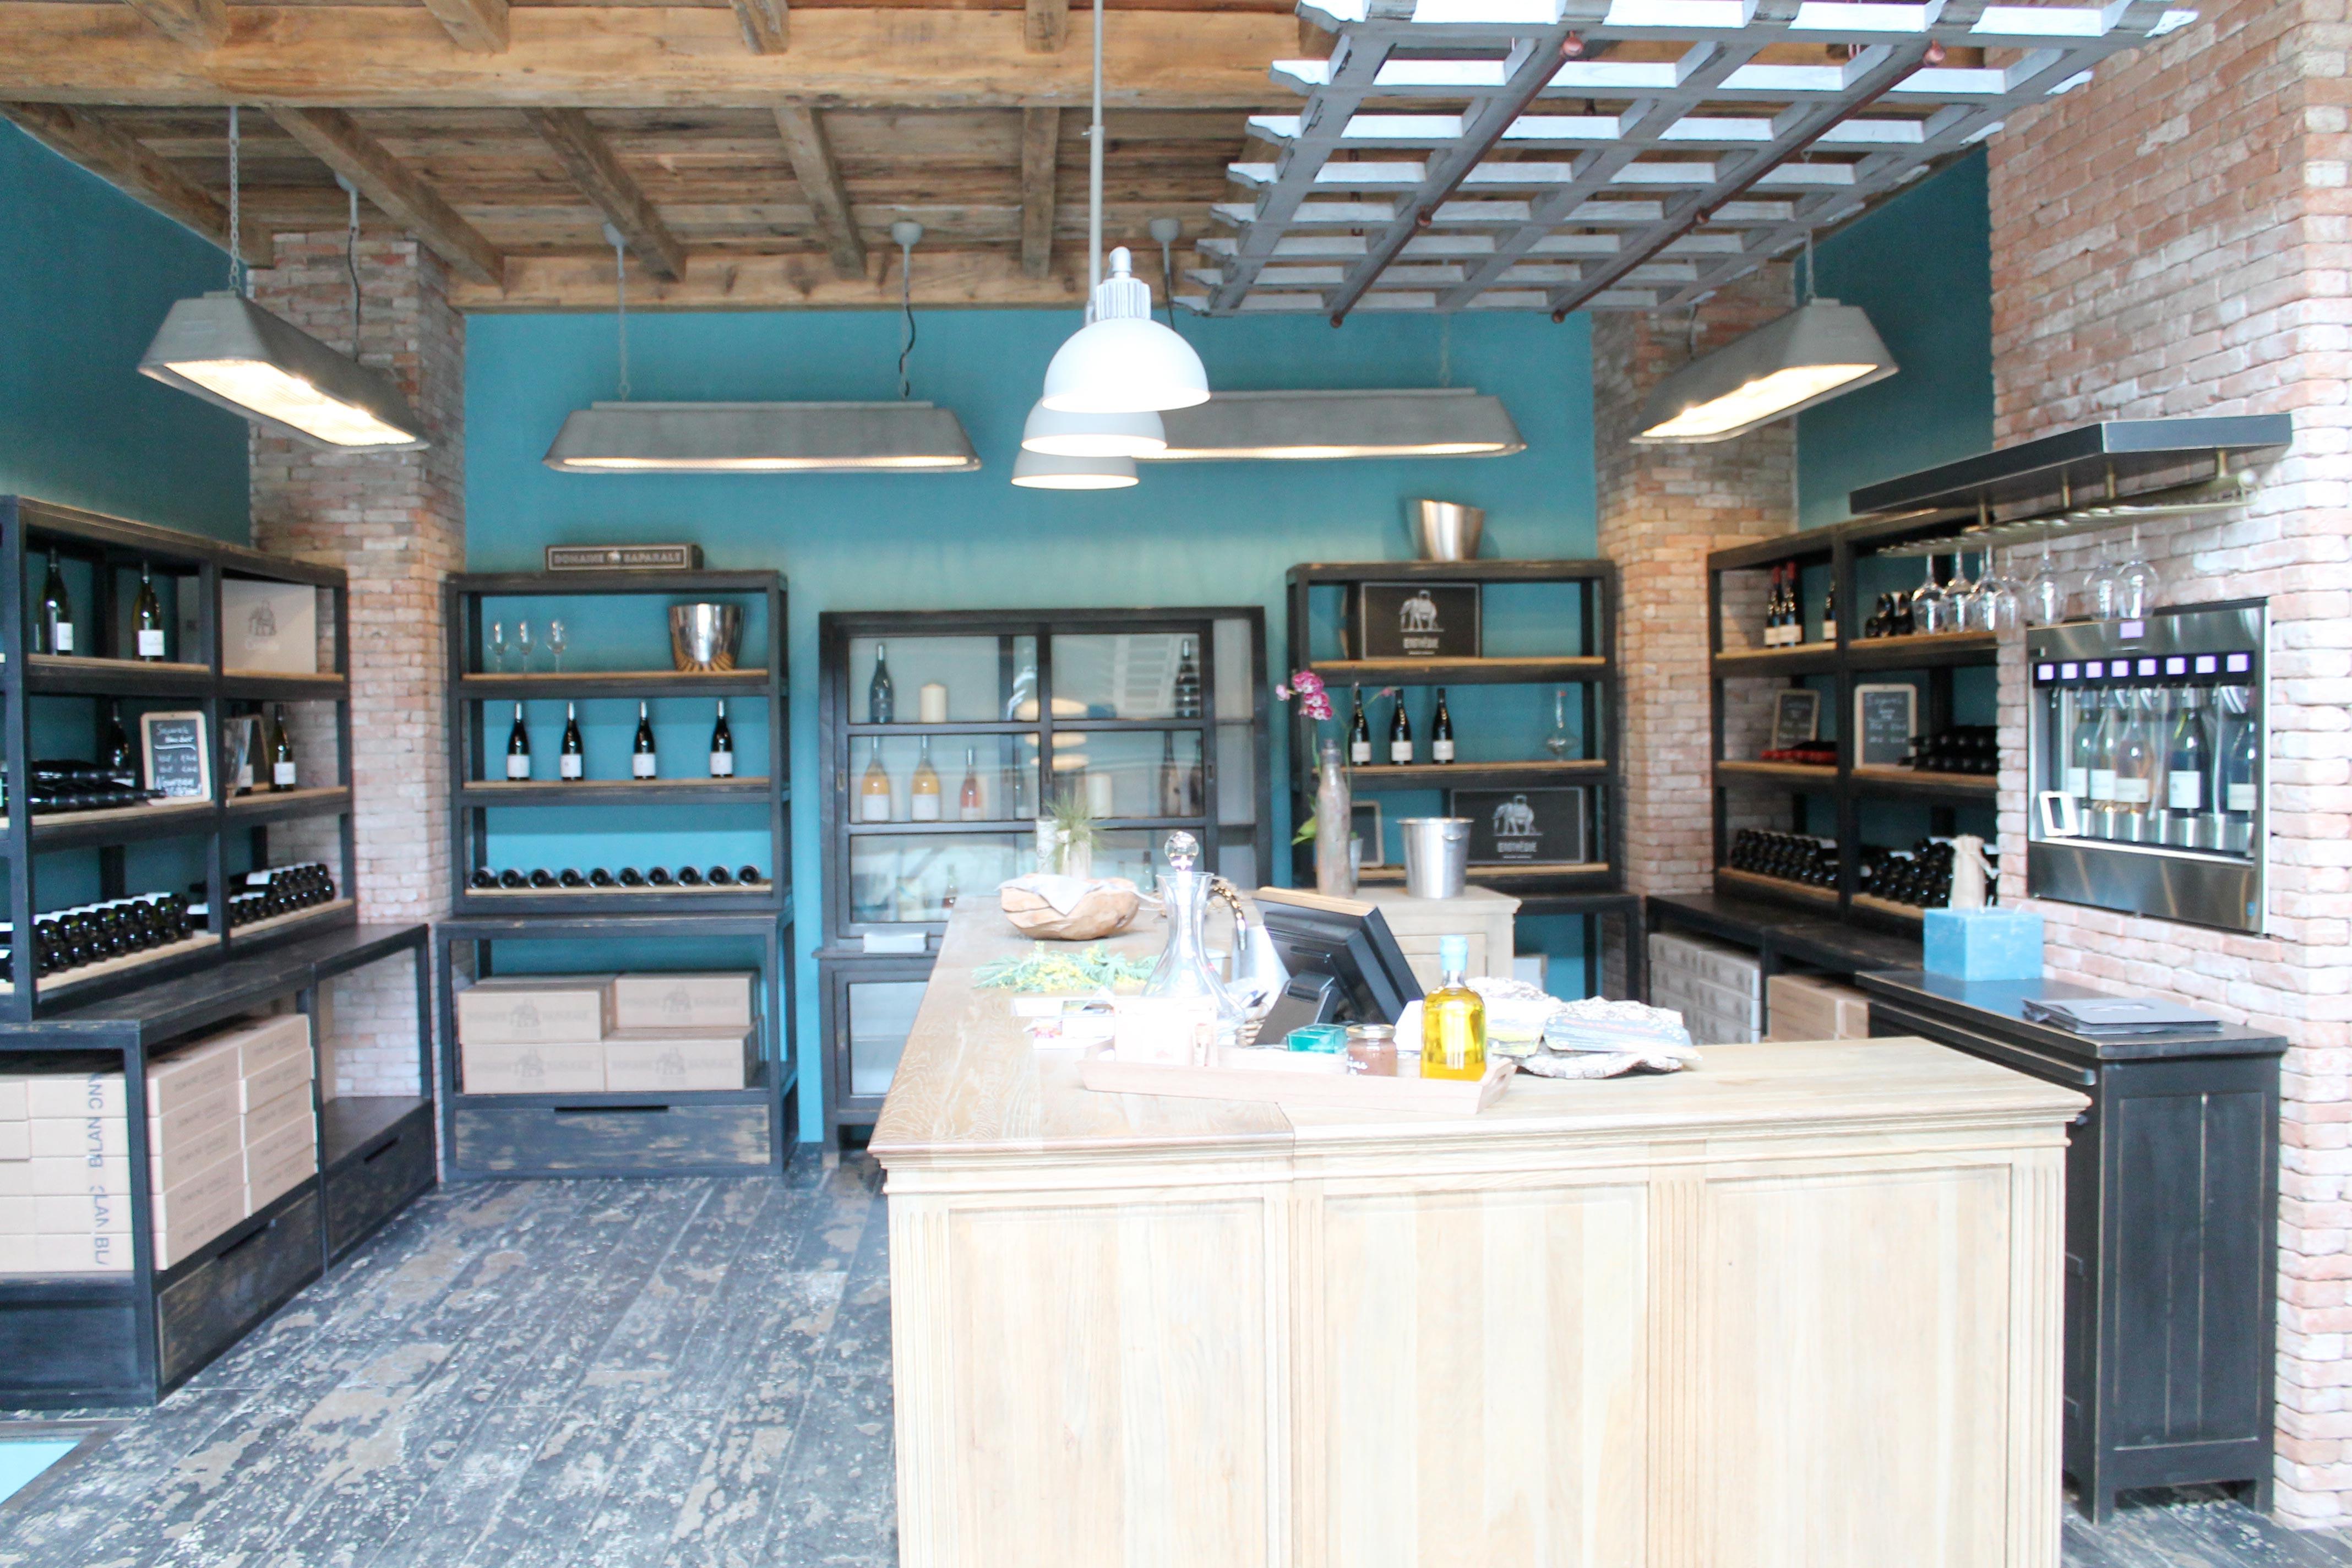 Corsica wine tour, wiine tasting room in an estate